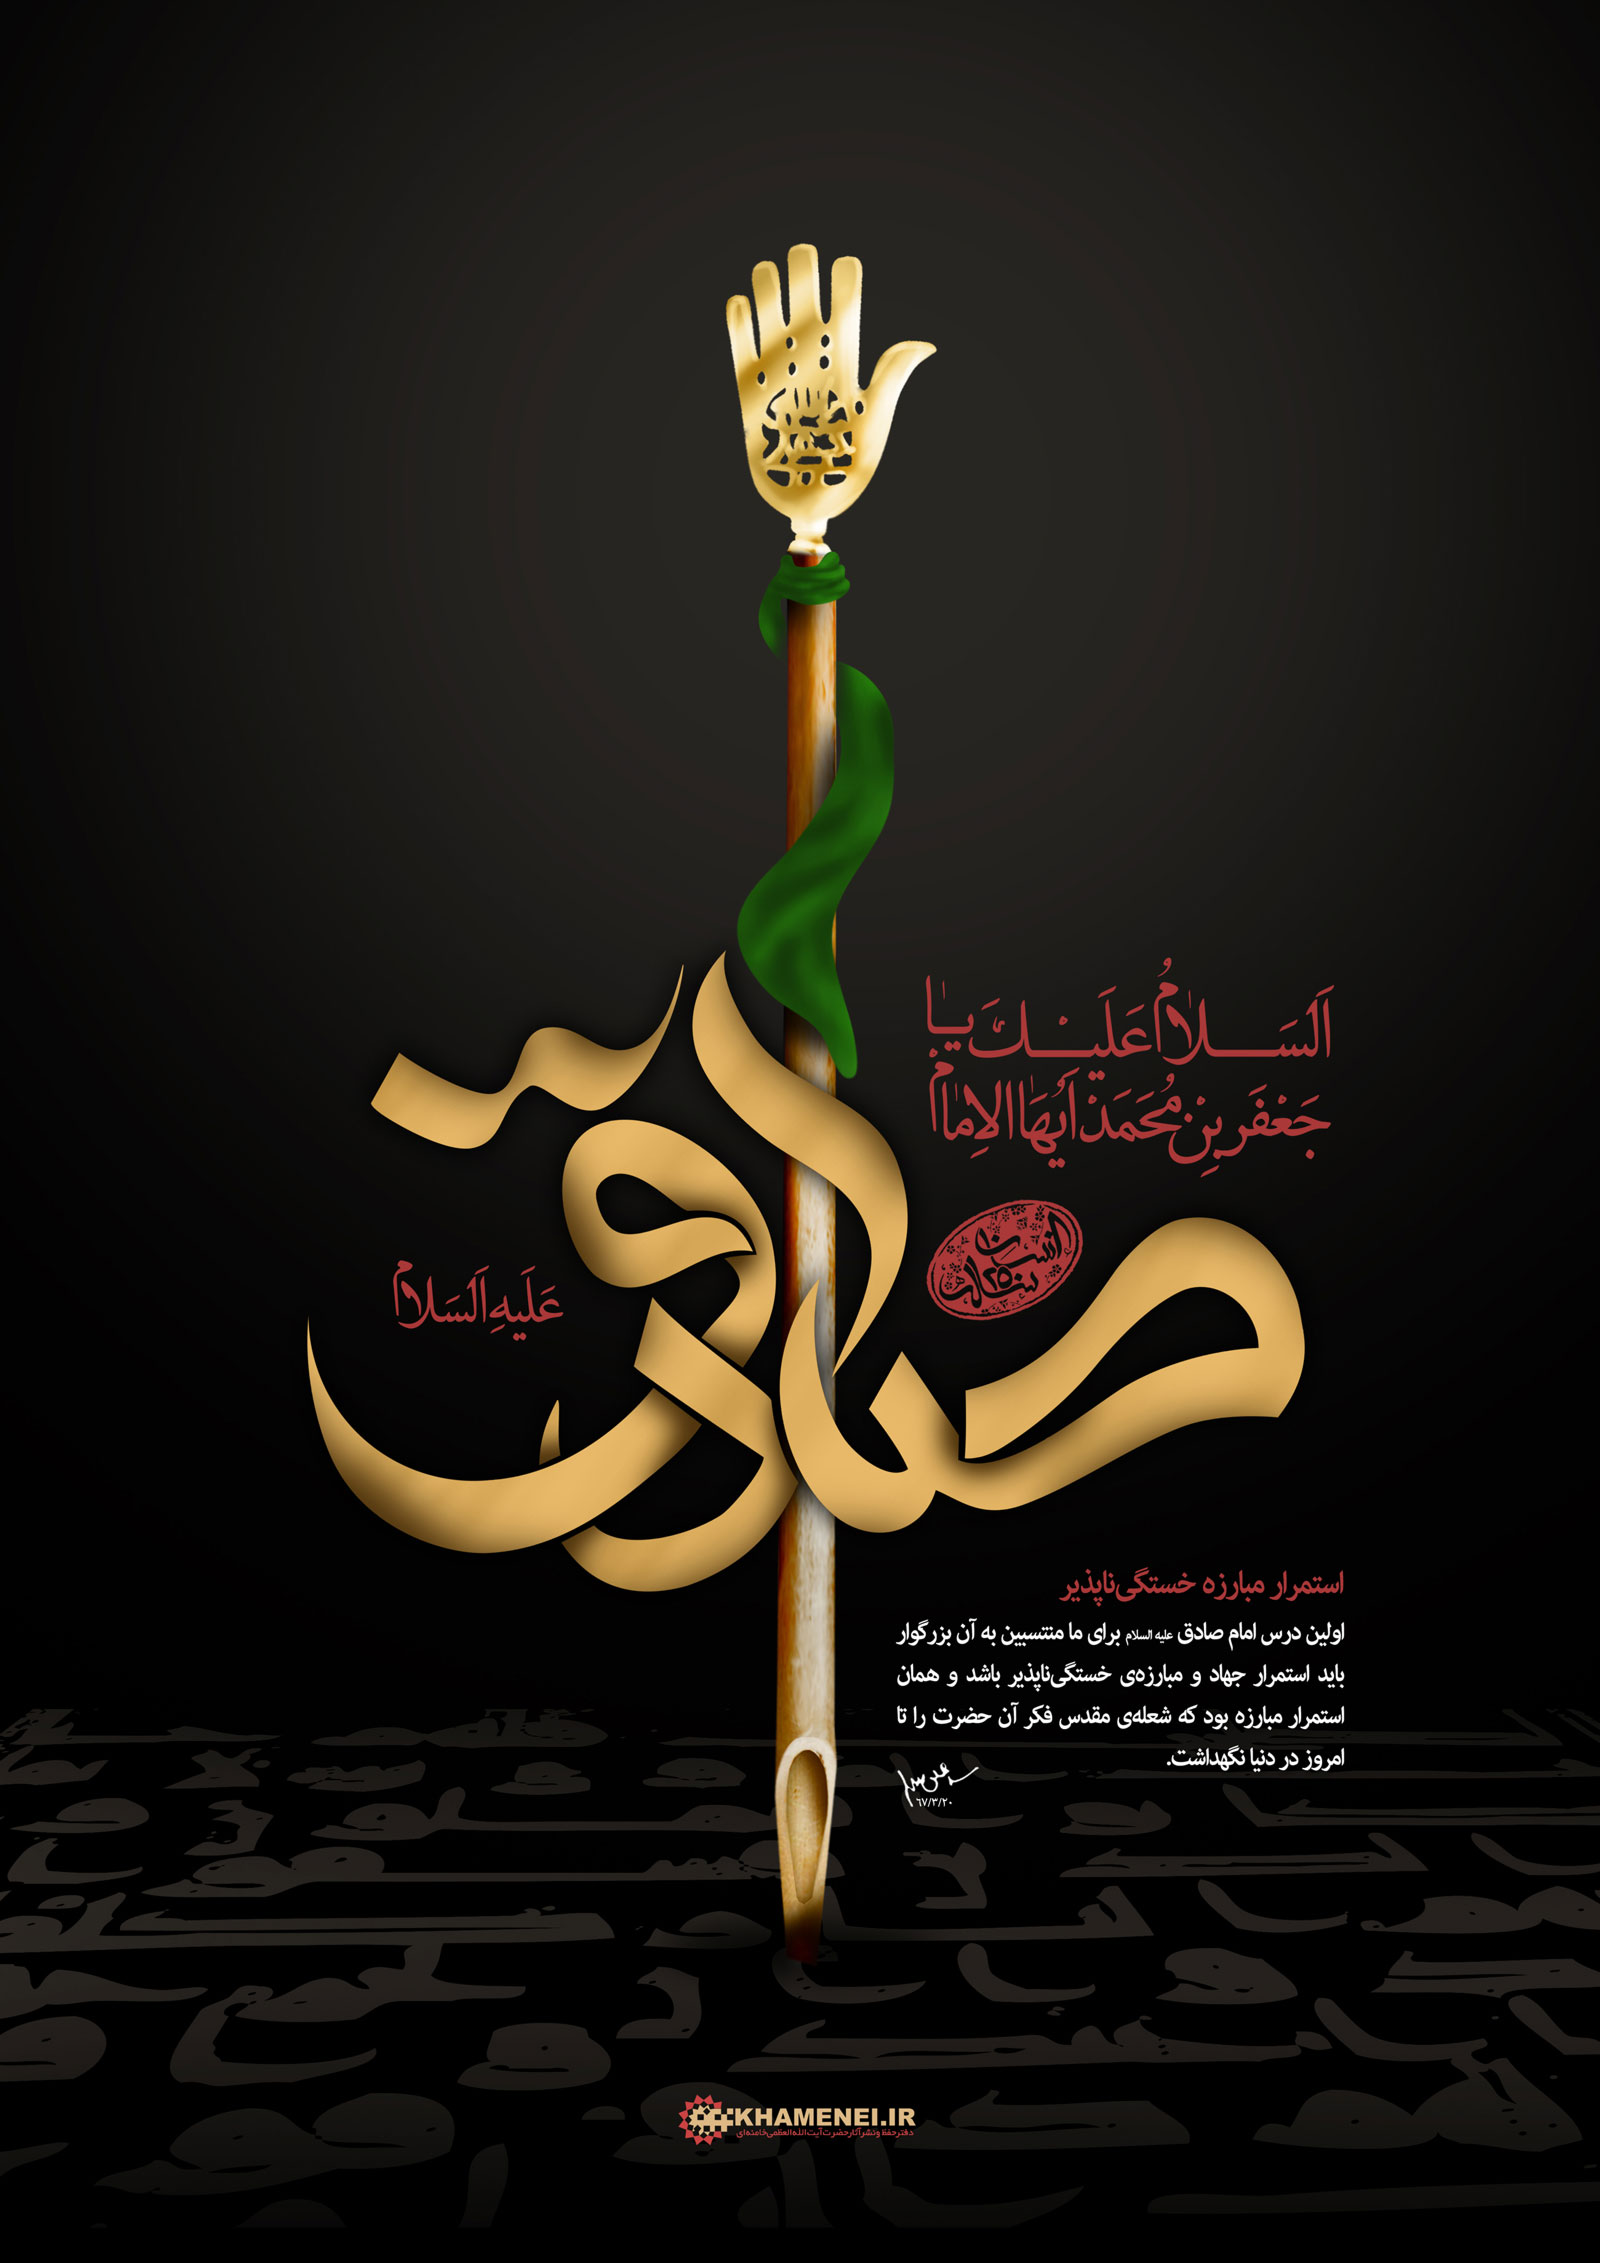 تصاویر شهادت امام جعفر صادق علیه السلام